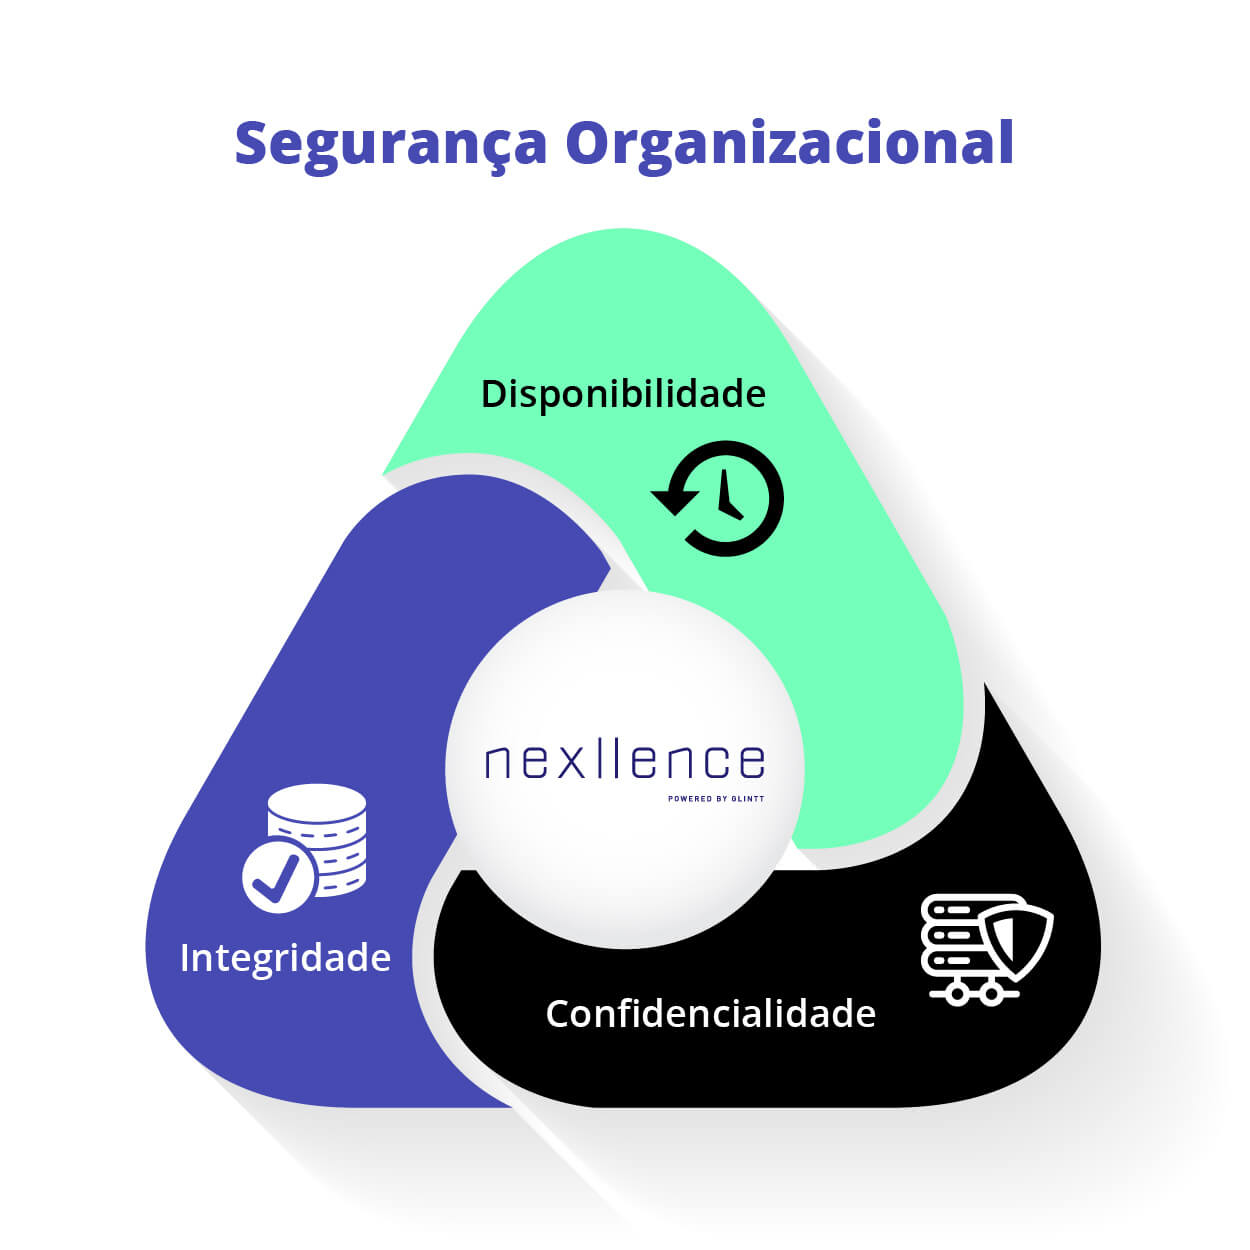 seguranca-organizacional